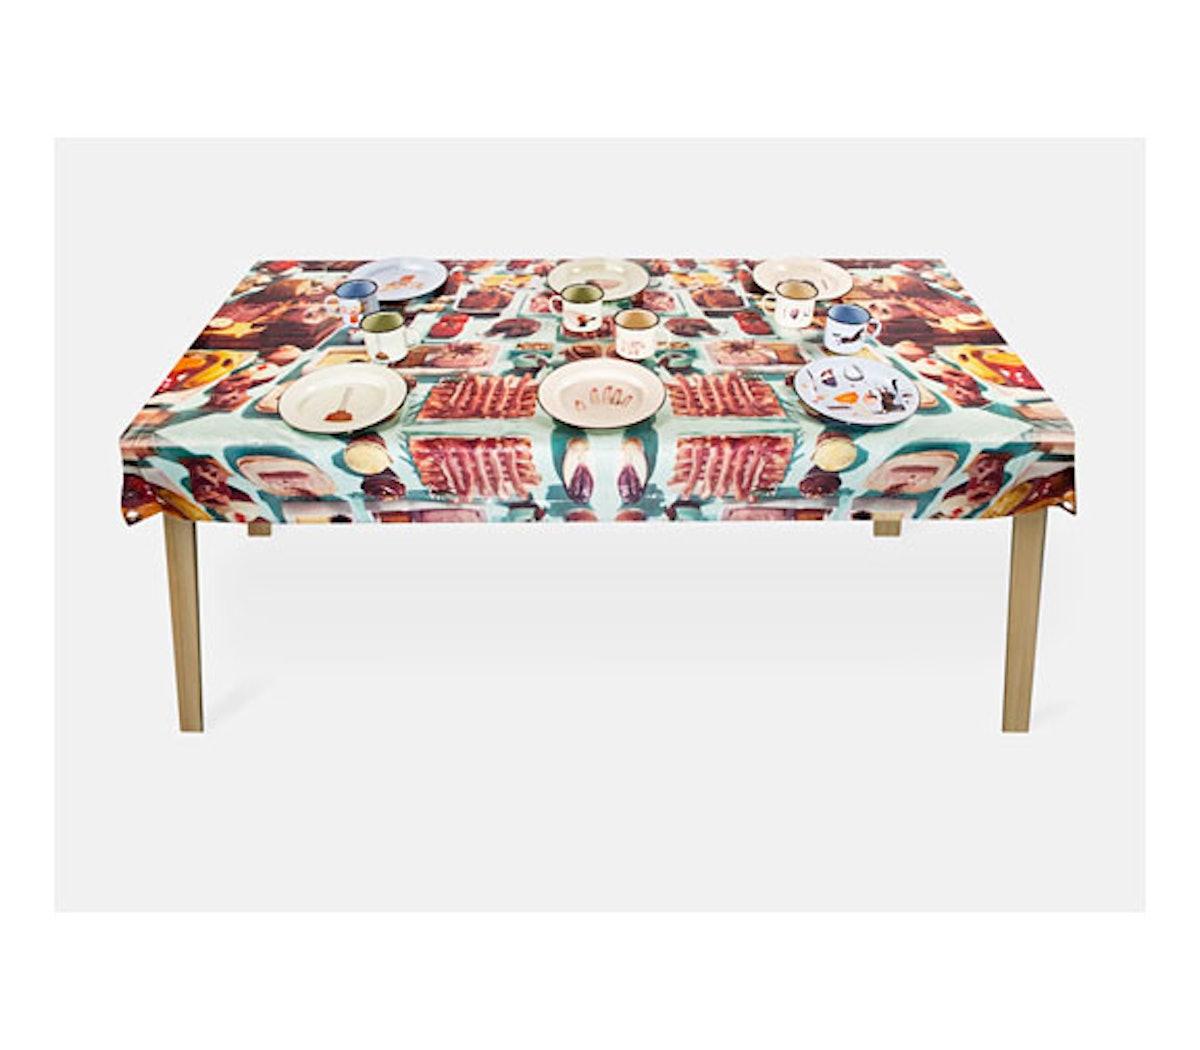 Maurizio Cattelan Tablecloth